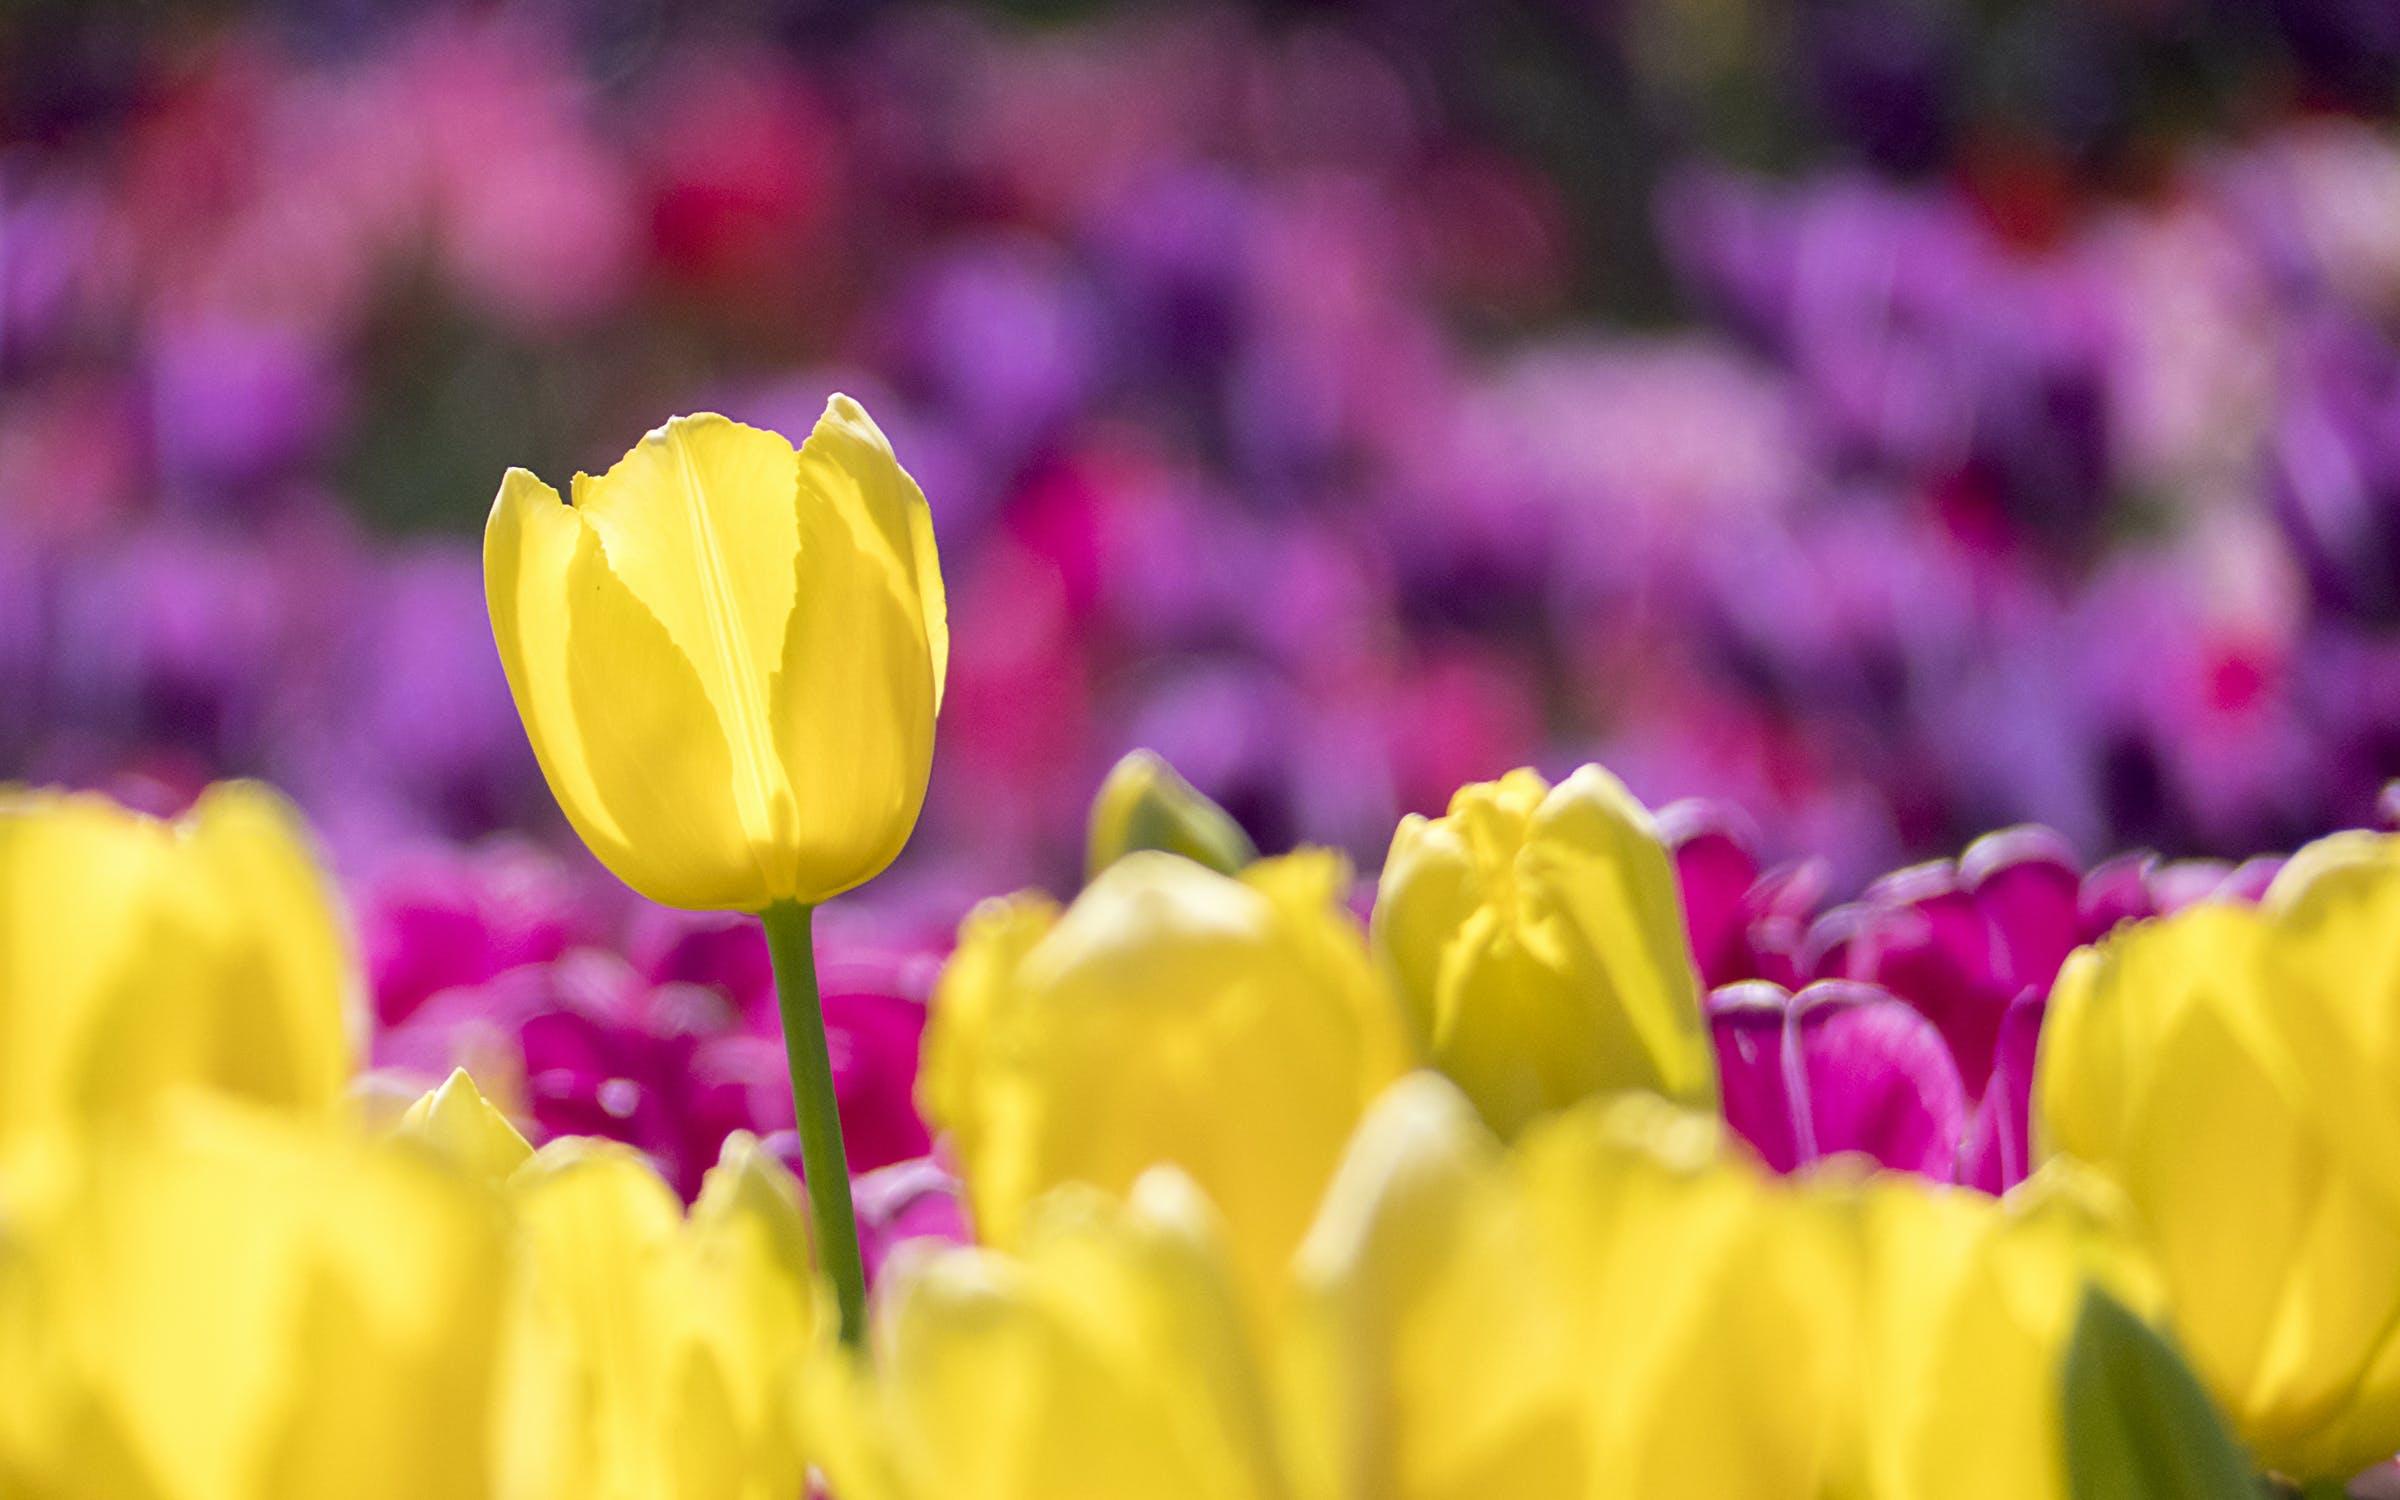 blühen, blume, blütenblätter